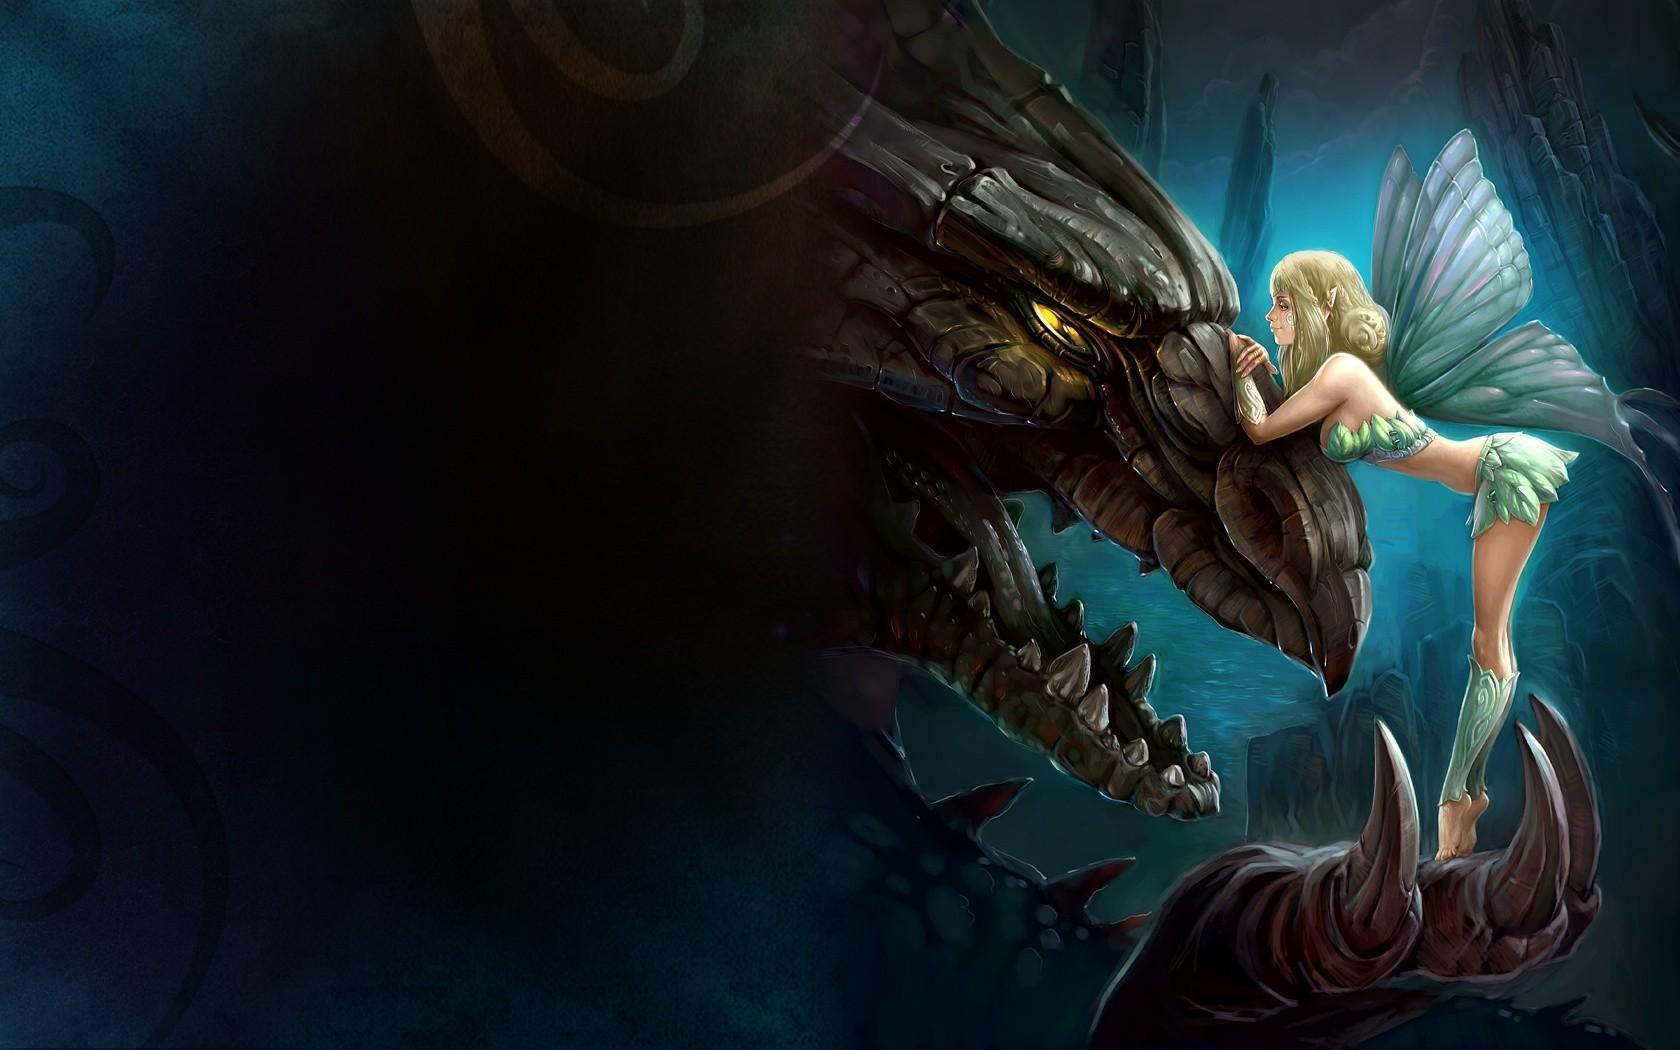 Dragon Girl Wallpapers - Wallpaper Cave